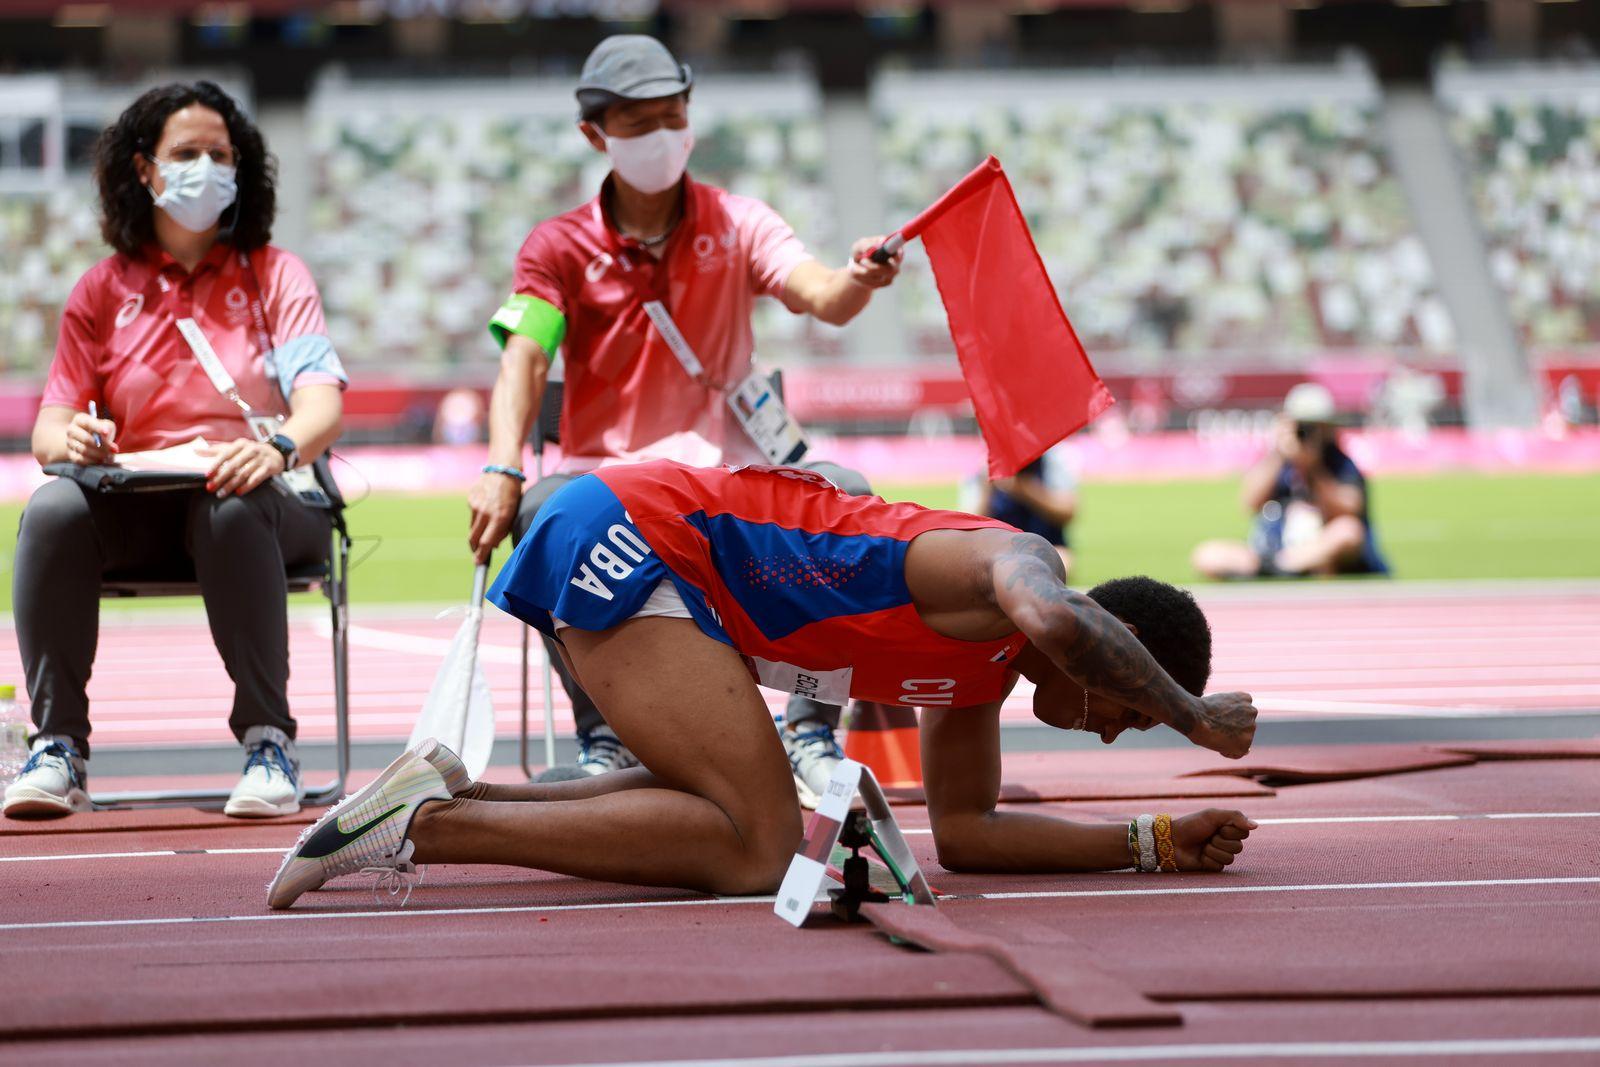 Athletics - Men's Long Jump - Final